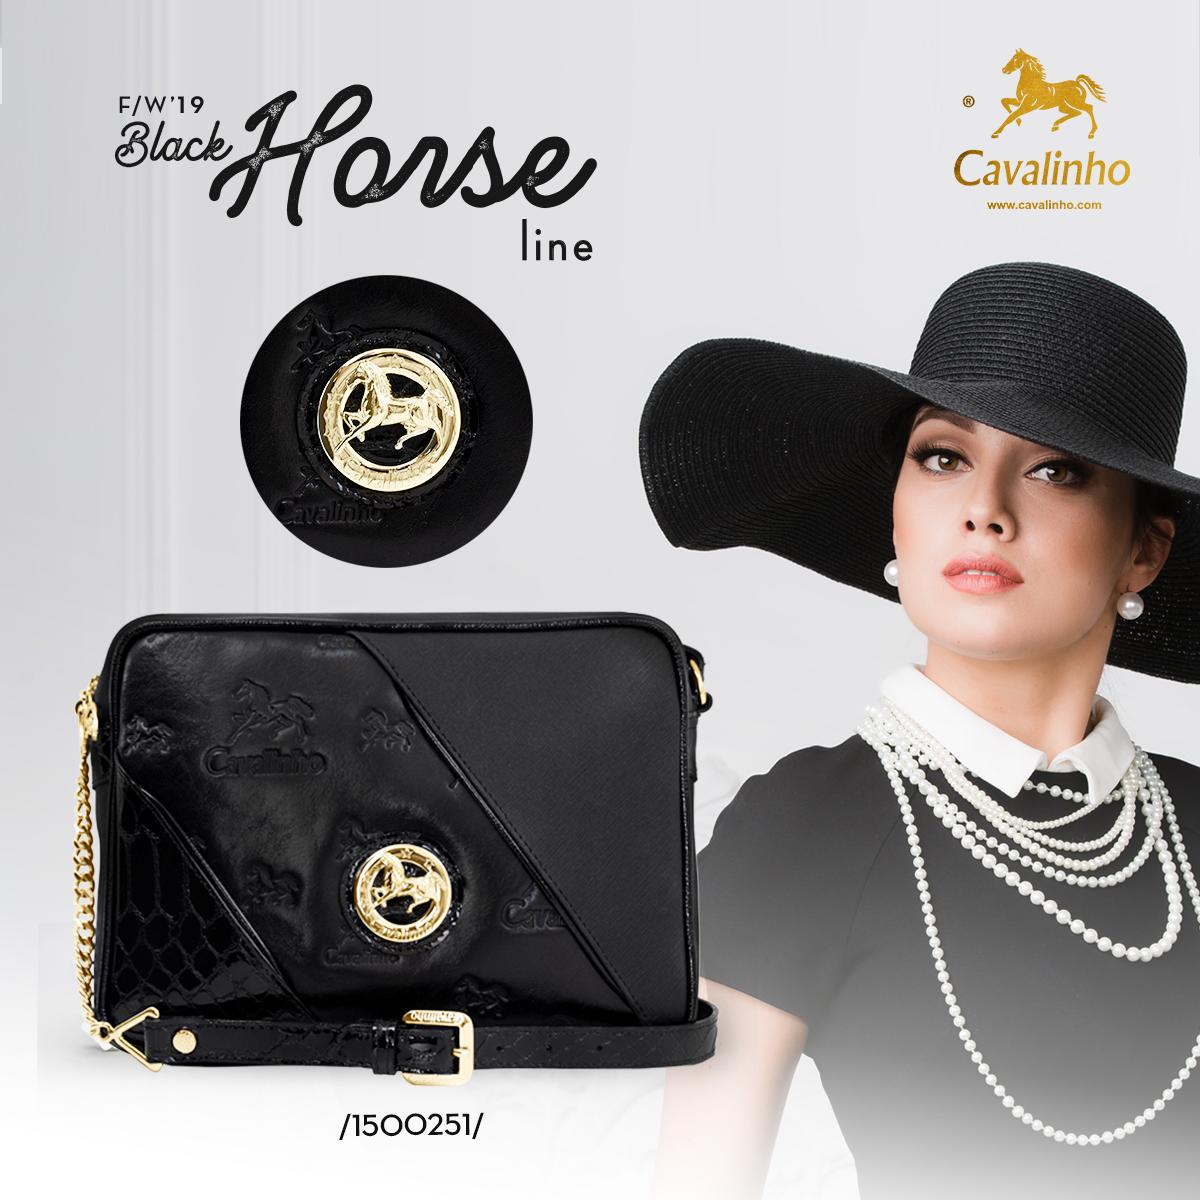 Black Horse Line FW'19